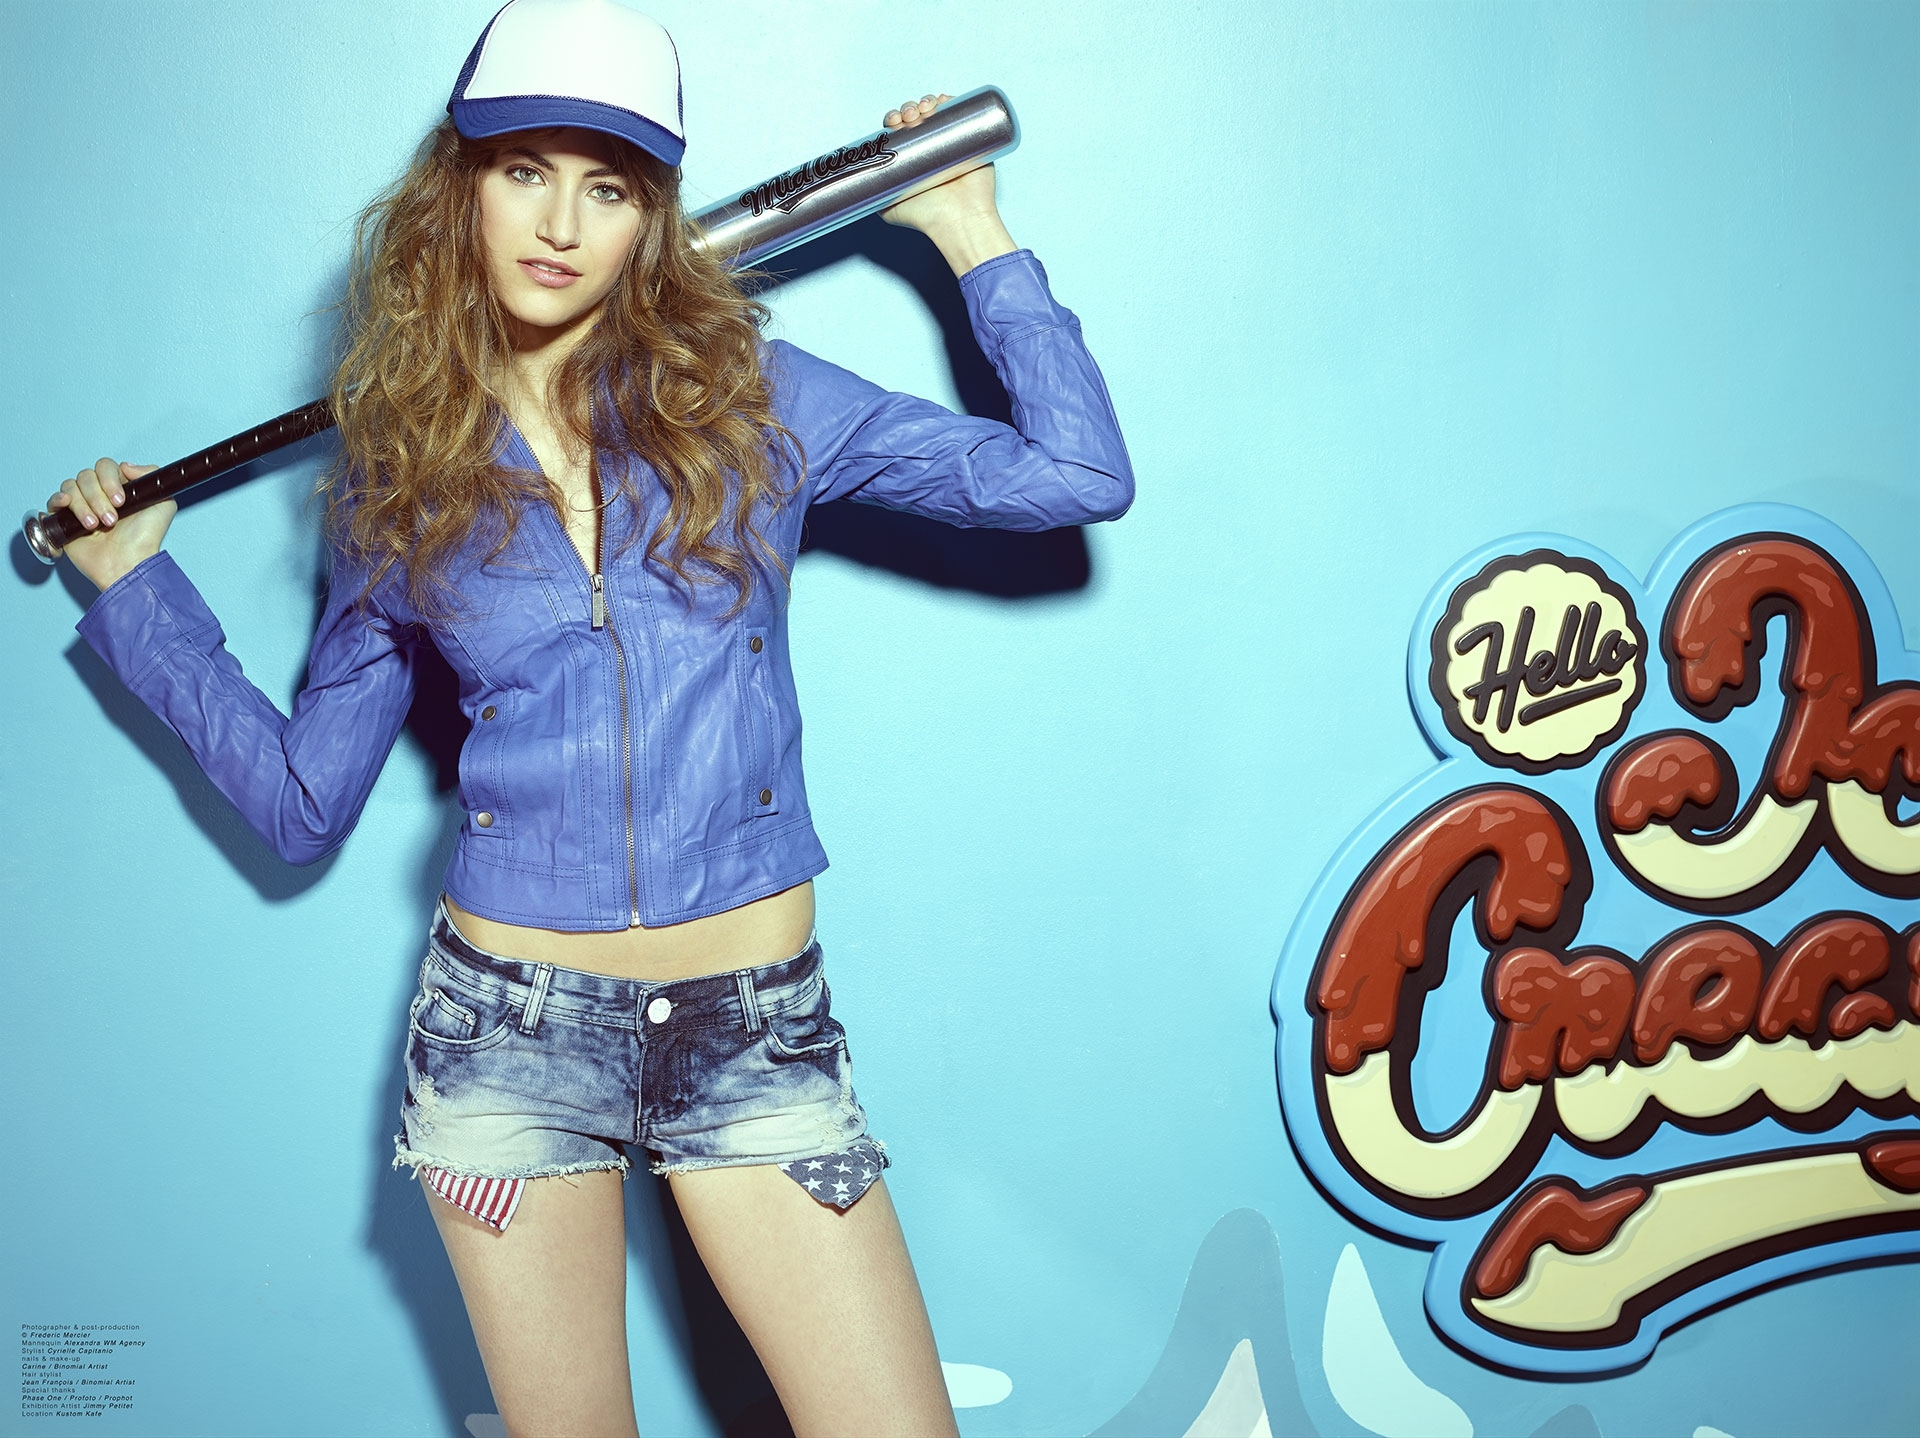 bar pub rock girl frederic mercier photographer edito lifestyle us american dream jean fashion one color